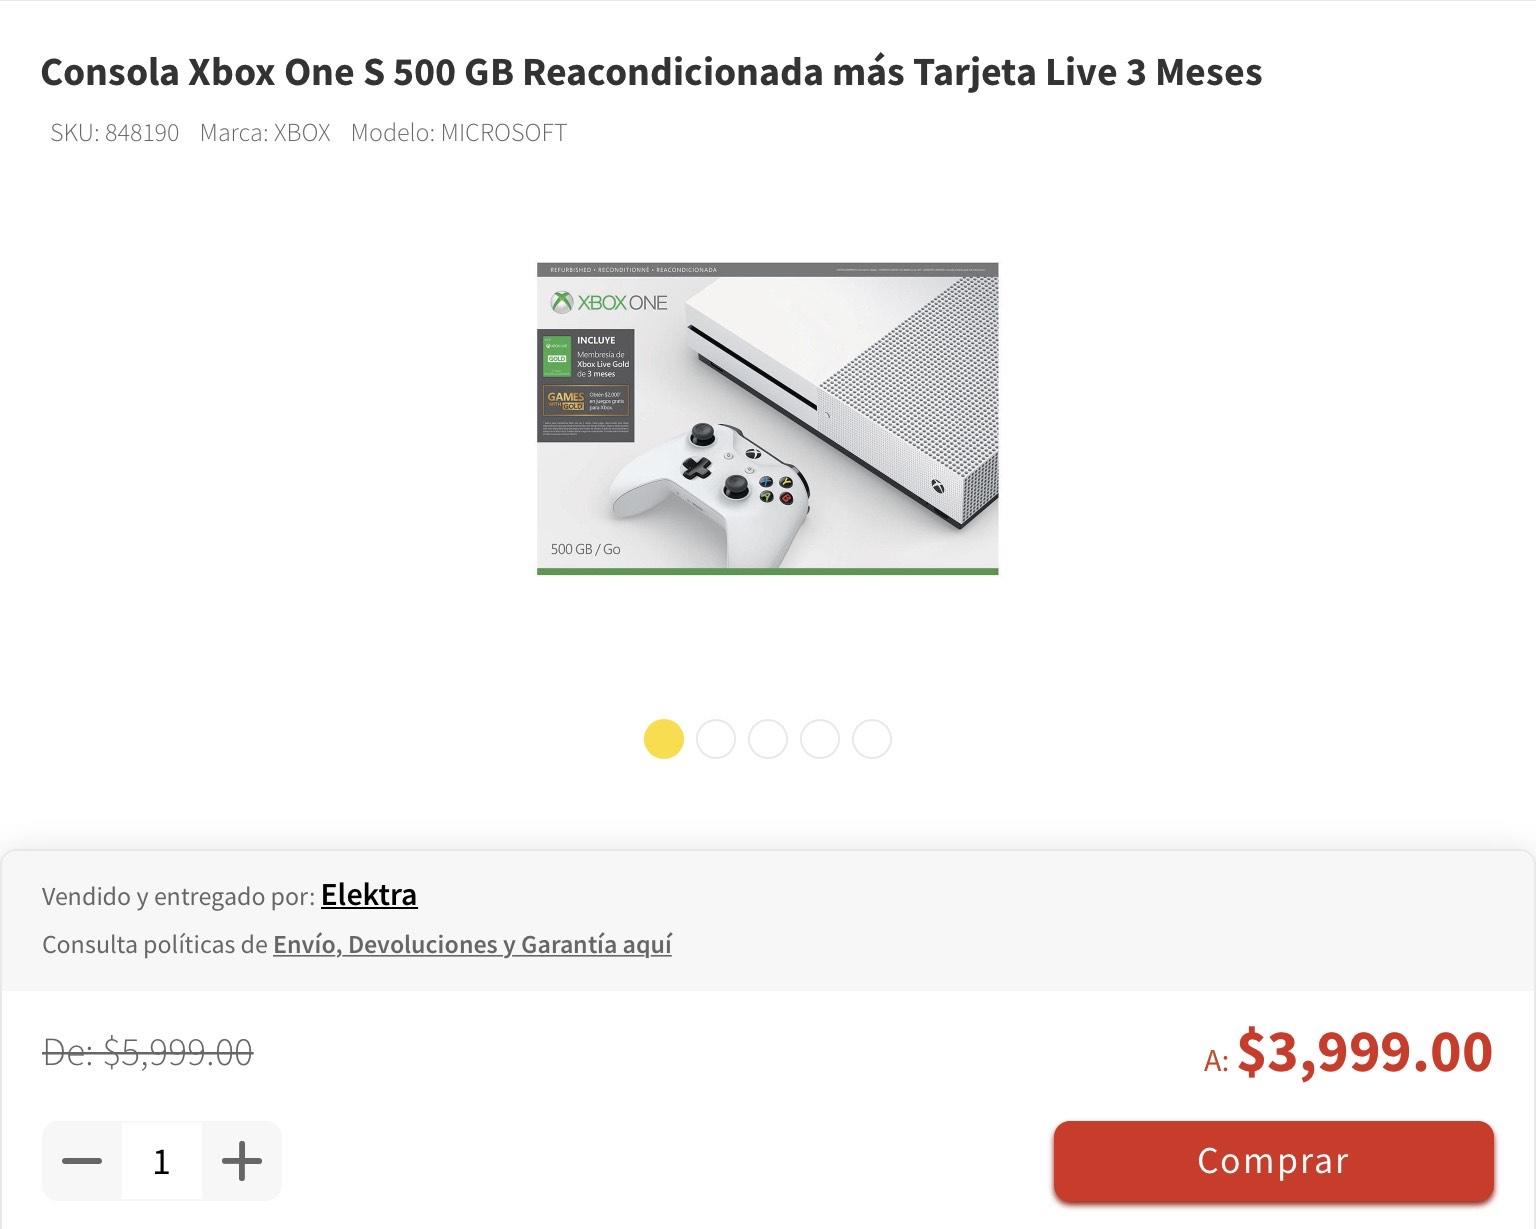 elektra Consola Xbox One S 500 GB Reacondicionada más Tarjeta Live 3 Meses